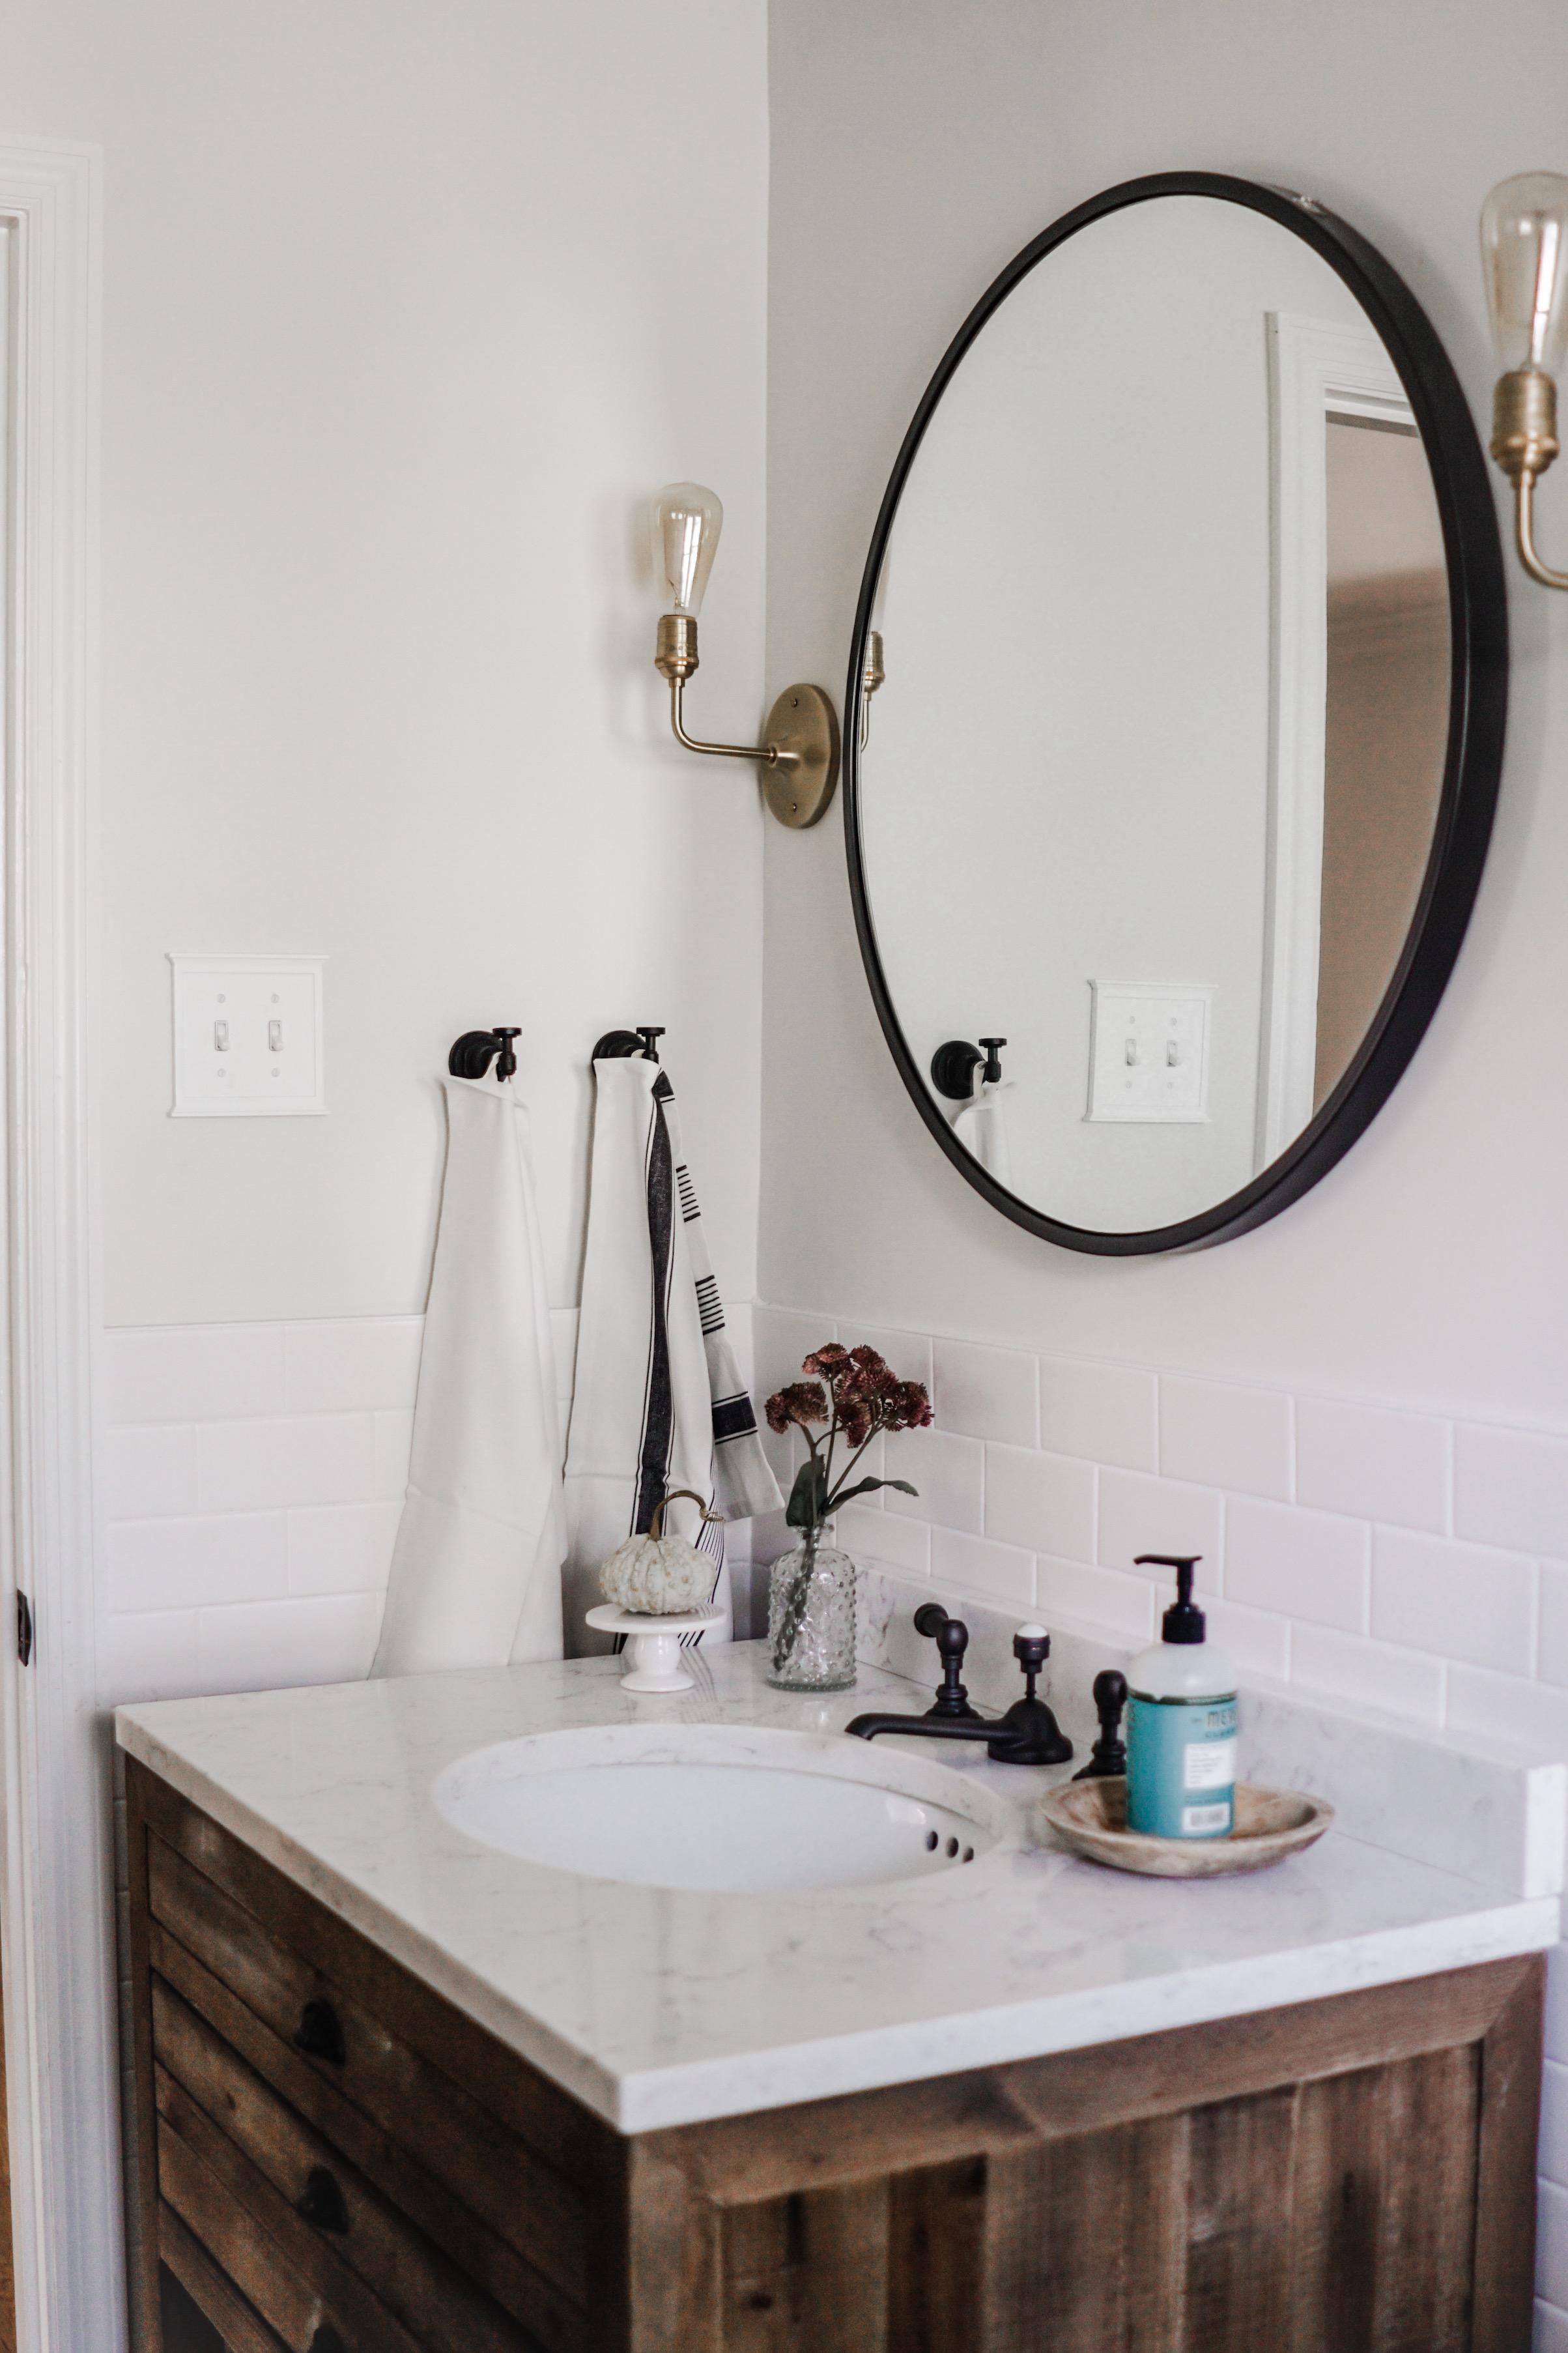 fall decor inspiration // fall bathroom decor ideas